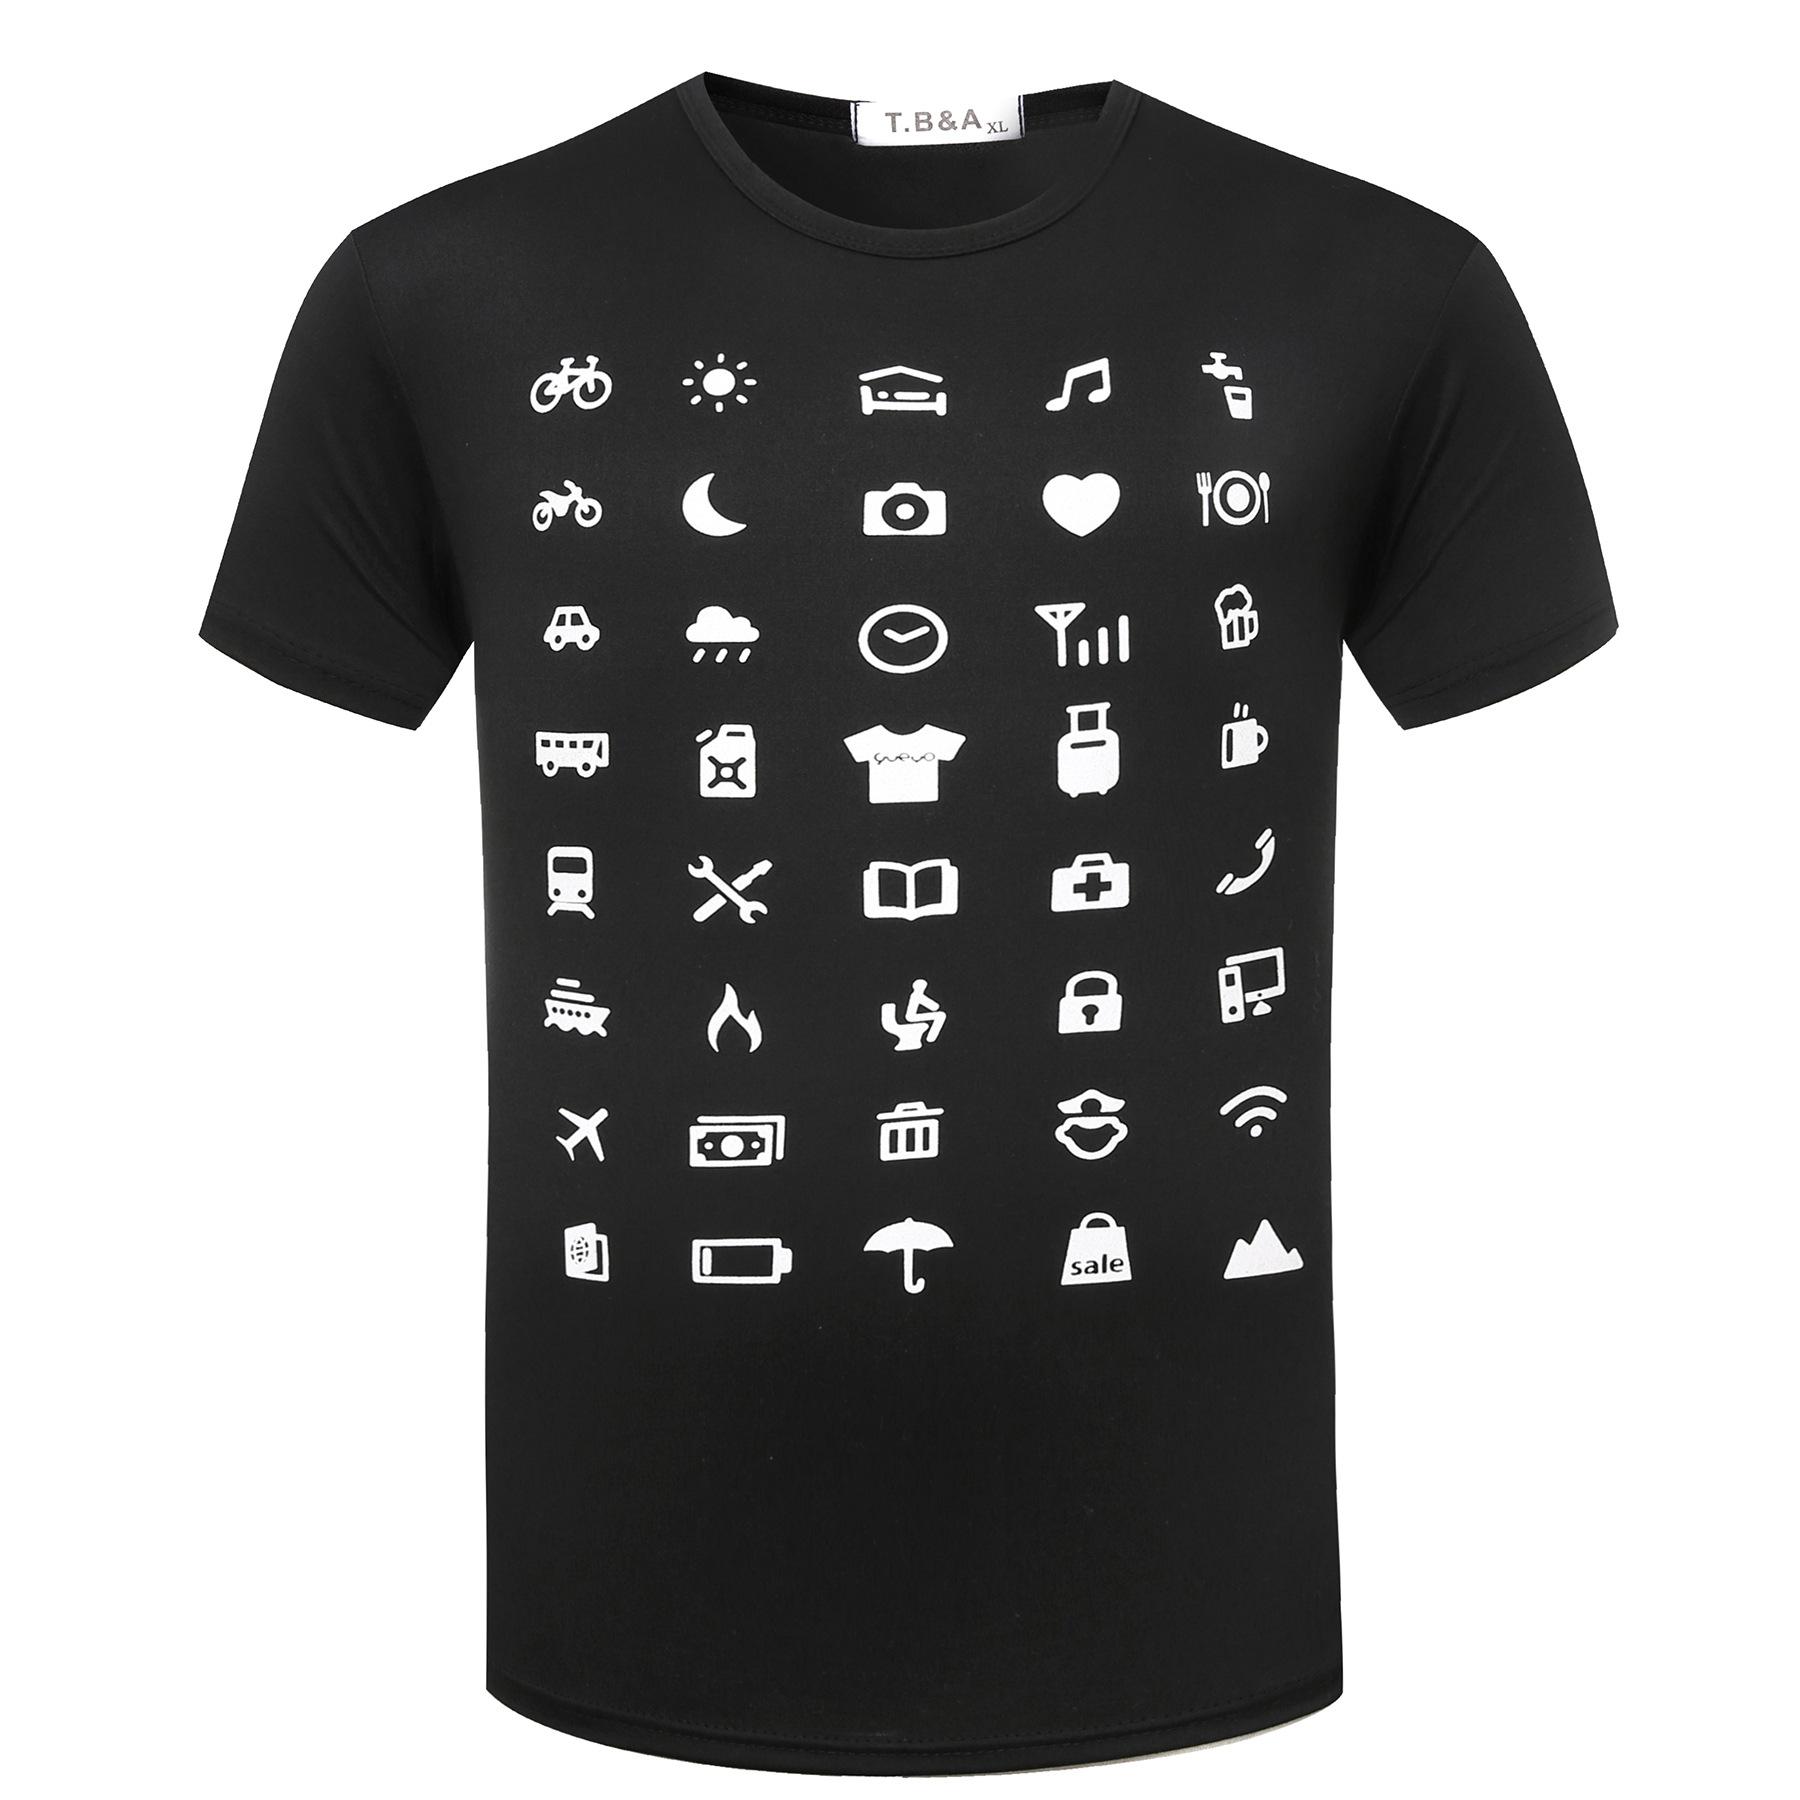 Travel Icon T-Shirt Summer Traveller Backpacking Global World Tee Iconspeak White T Shirts Unisex Funny Tops Tee Shirt For Men(China (Mainland))